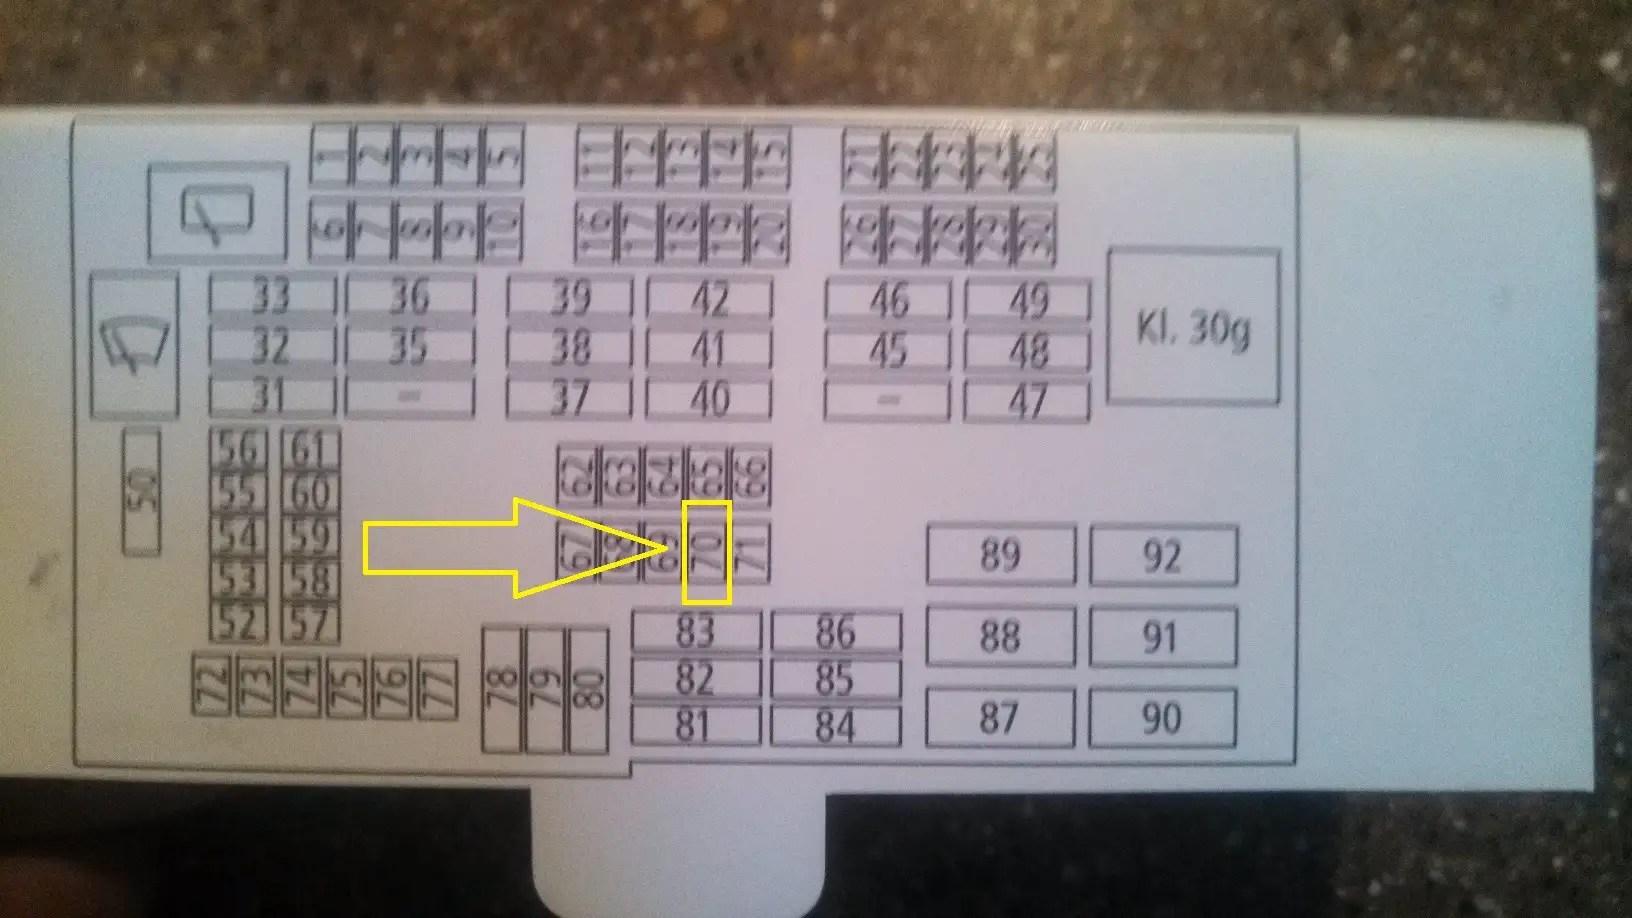 Kia Sportage Fuse Box Diagram As Well Vw Beetle Fuse Box Diagram